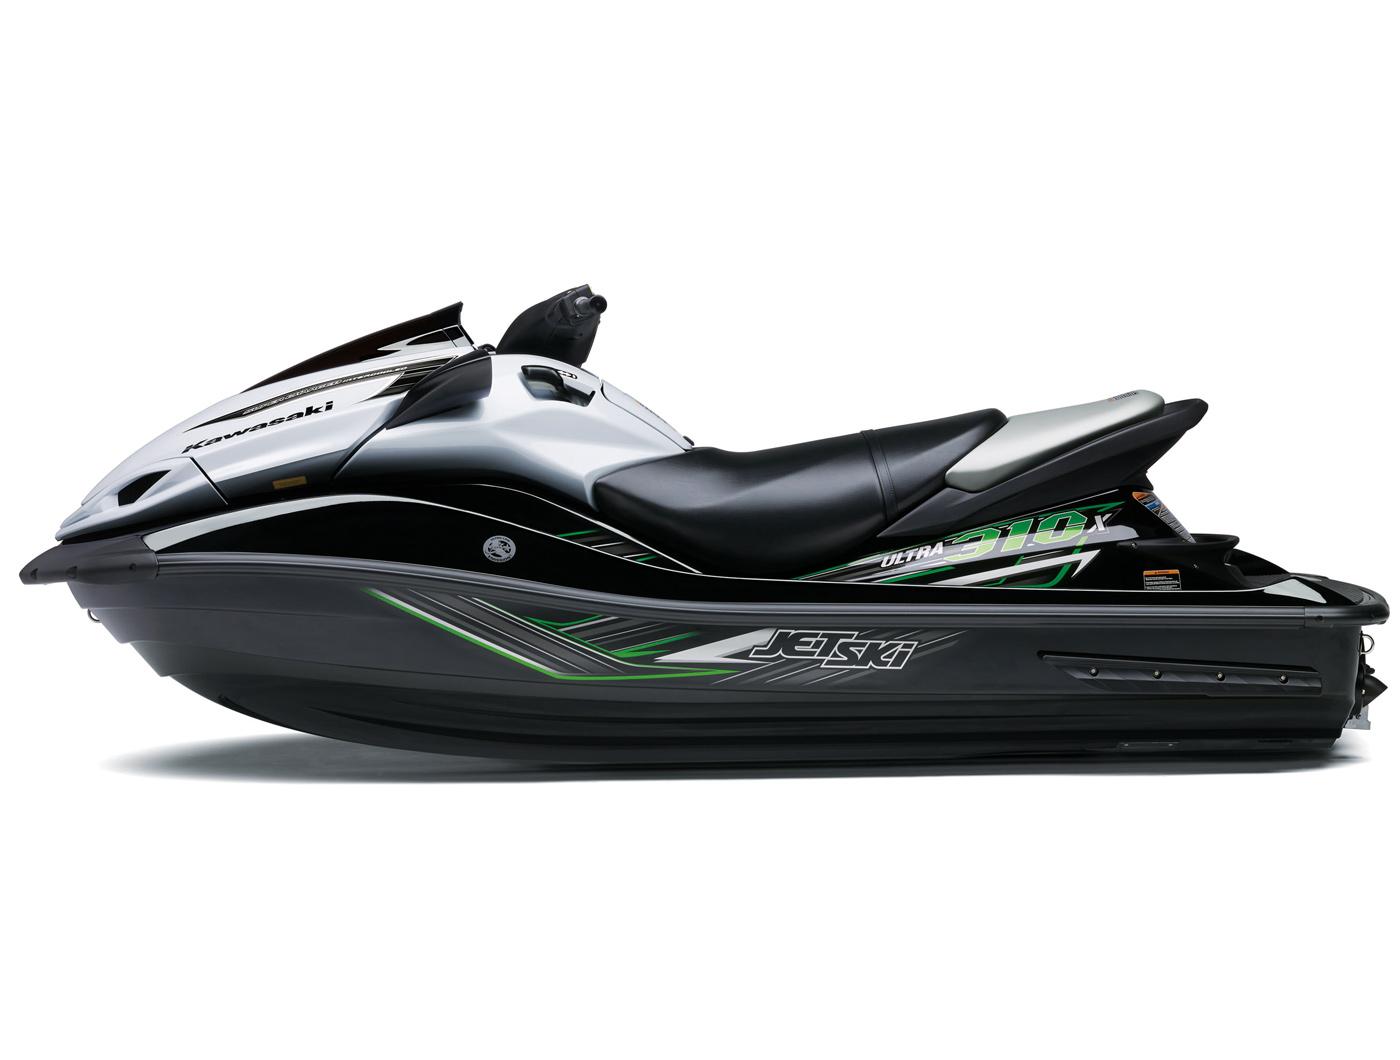 Kawasaki Ultra X Price